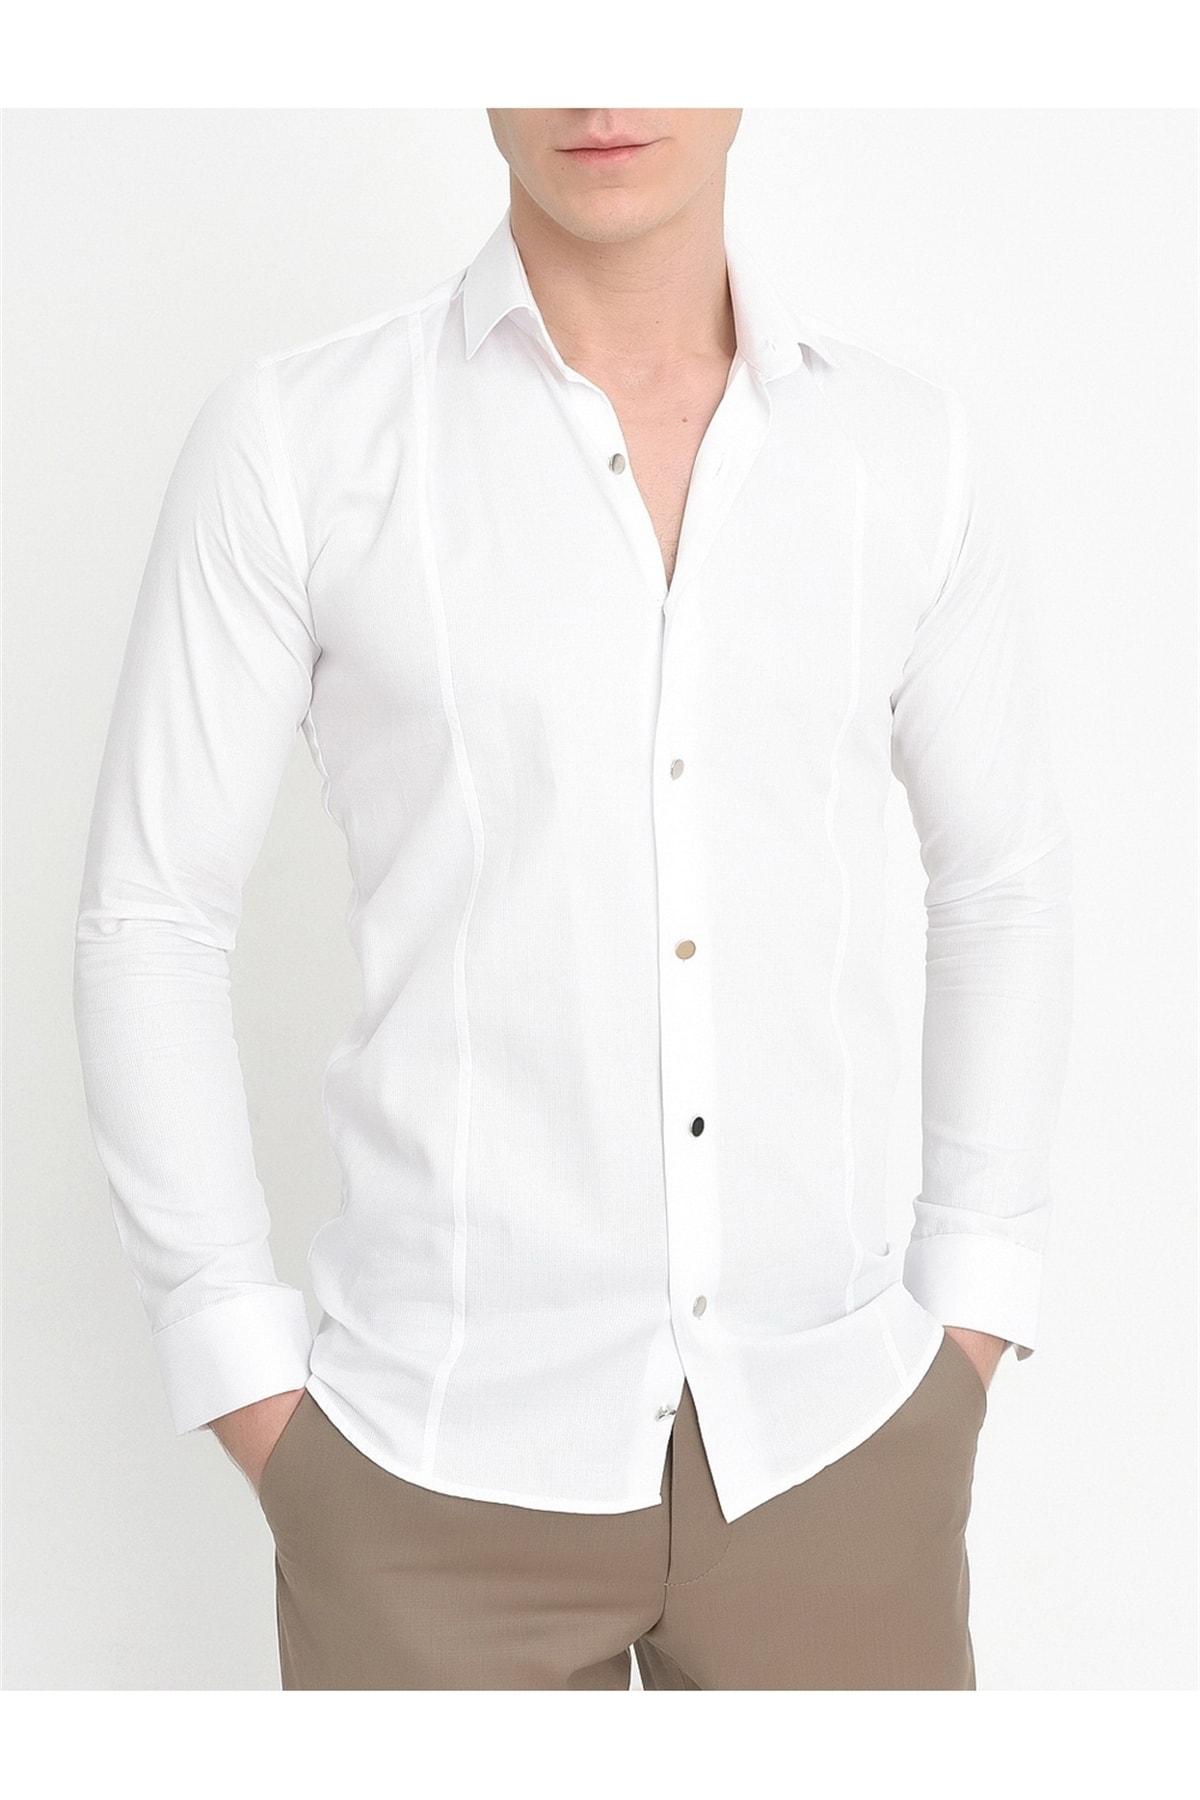 Efor G 1401 Slim Fit Beyaz Spor Gömlek 1